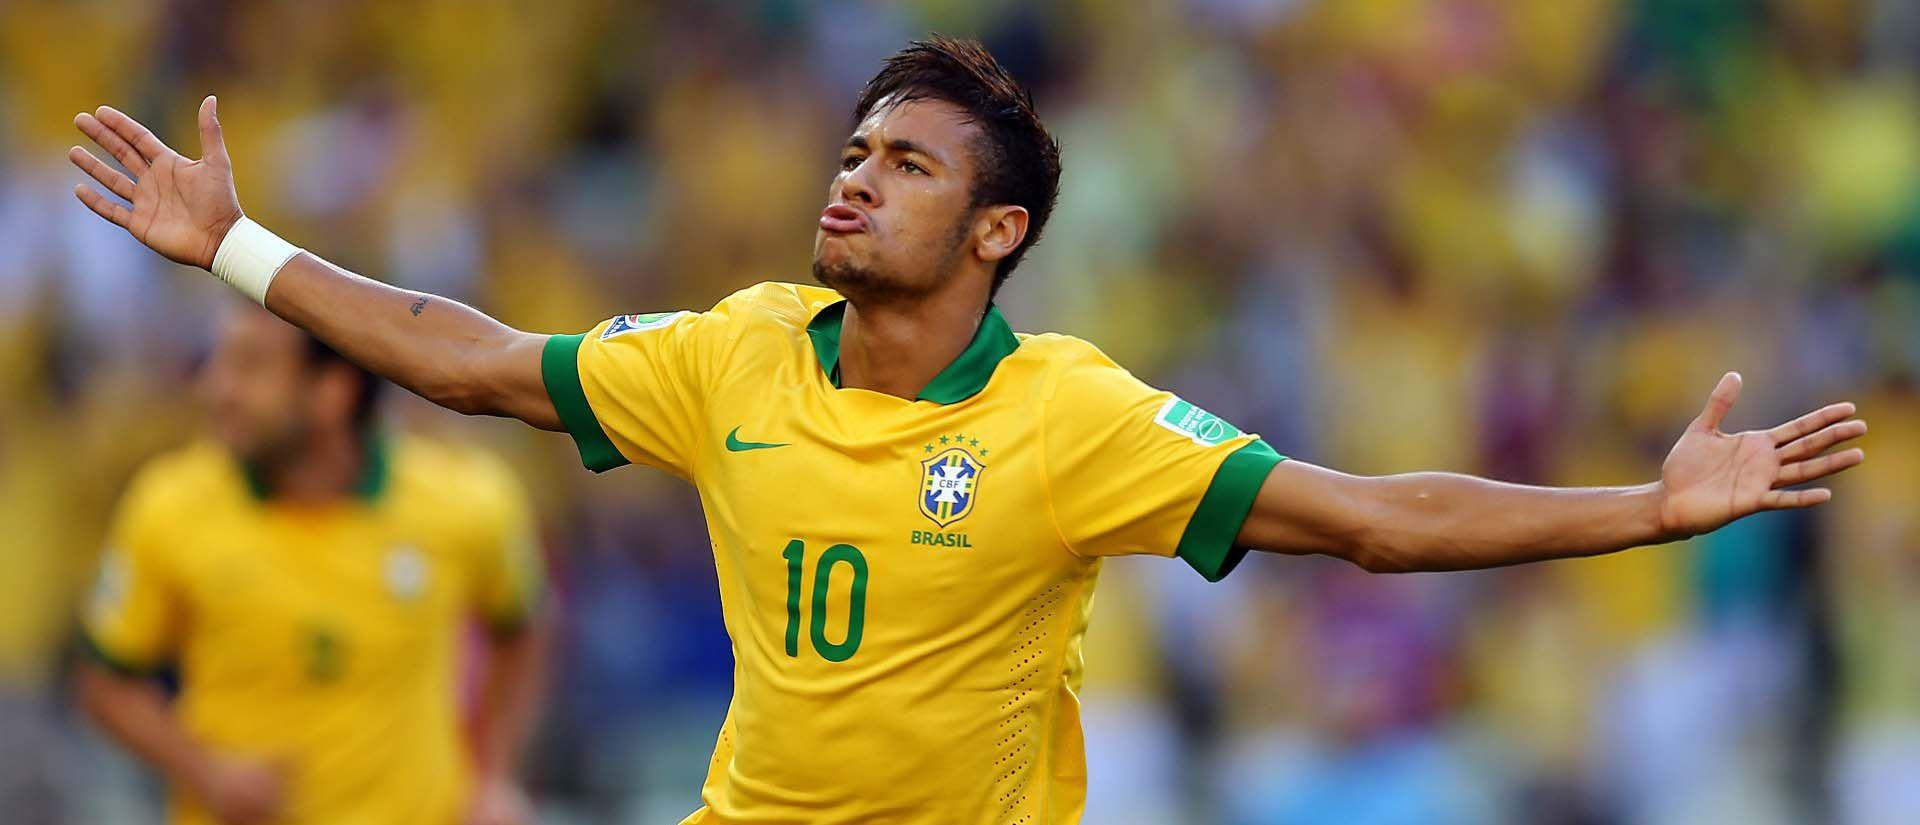 Neymar Brazil 2014 | Neymar double gives jittery Brazil winning start